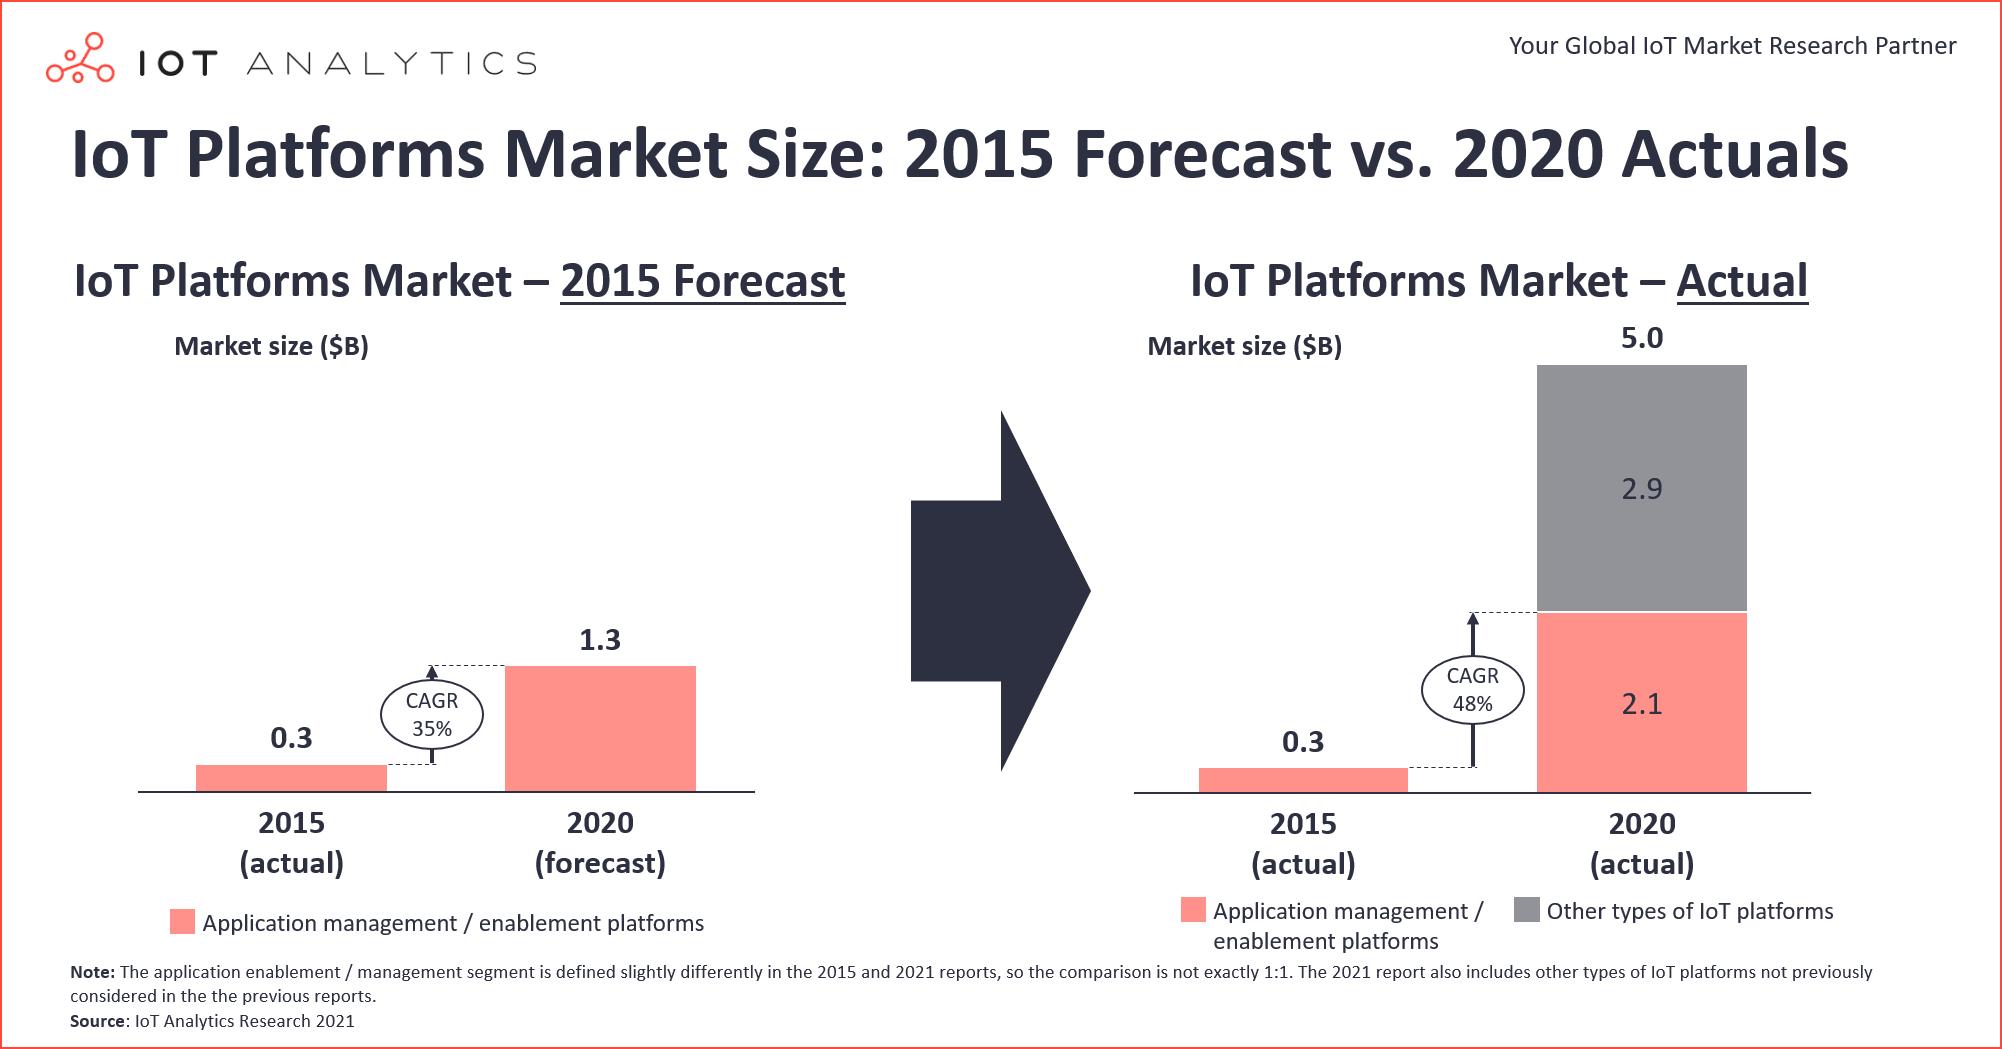 IoT Platforms Market Size: 2015 Forecast vs 2020 Actuals